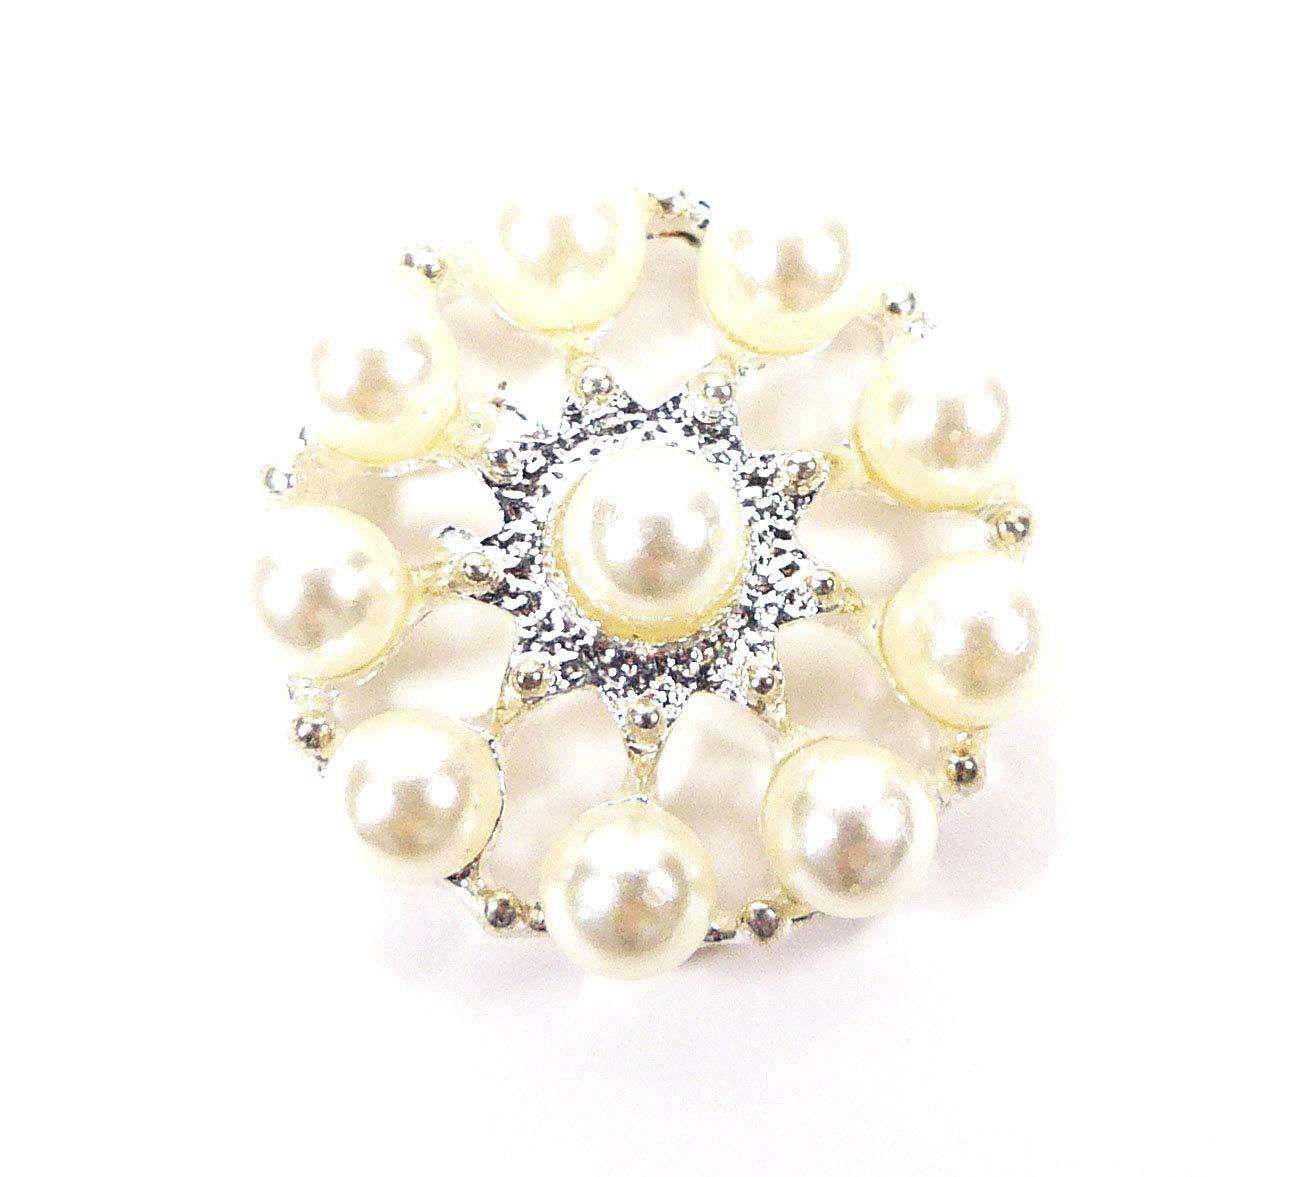 5x Diamante Crystal White Pearl Round Button Flatback Embellishment 25mm